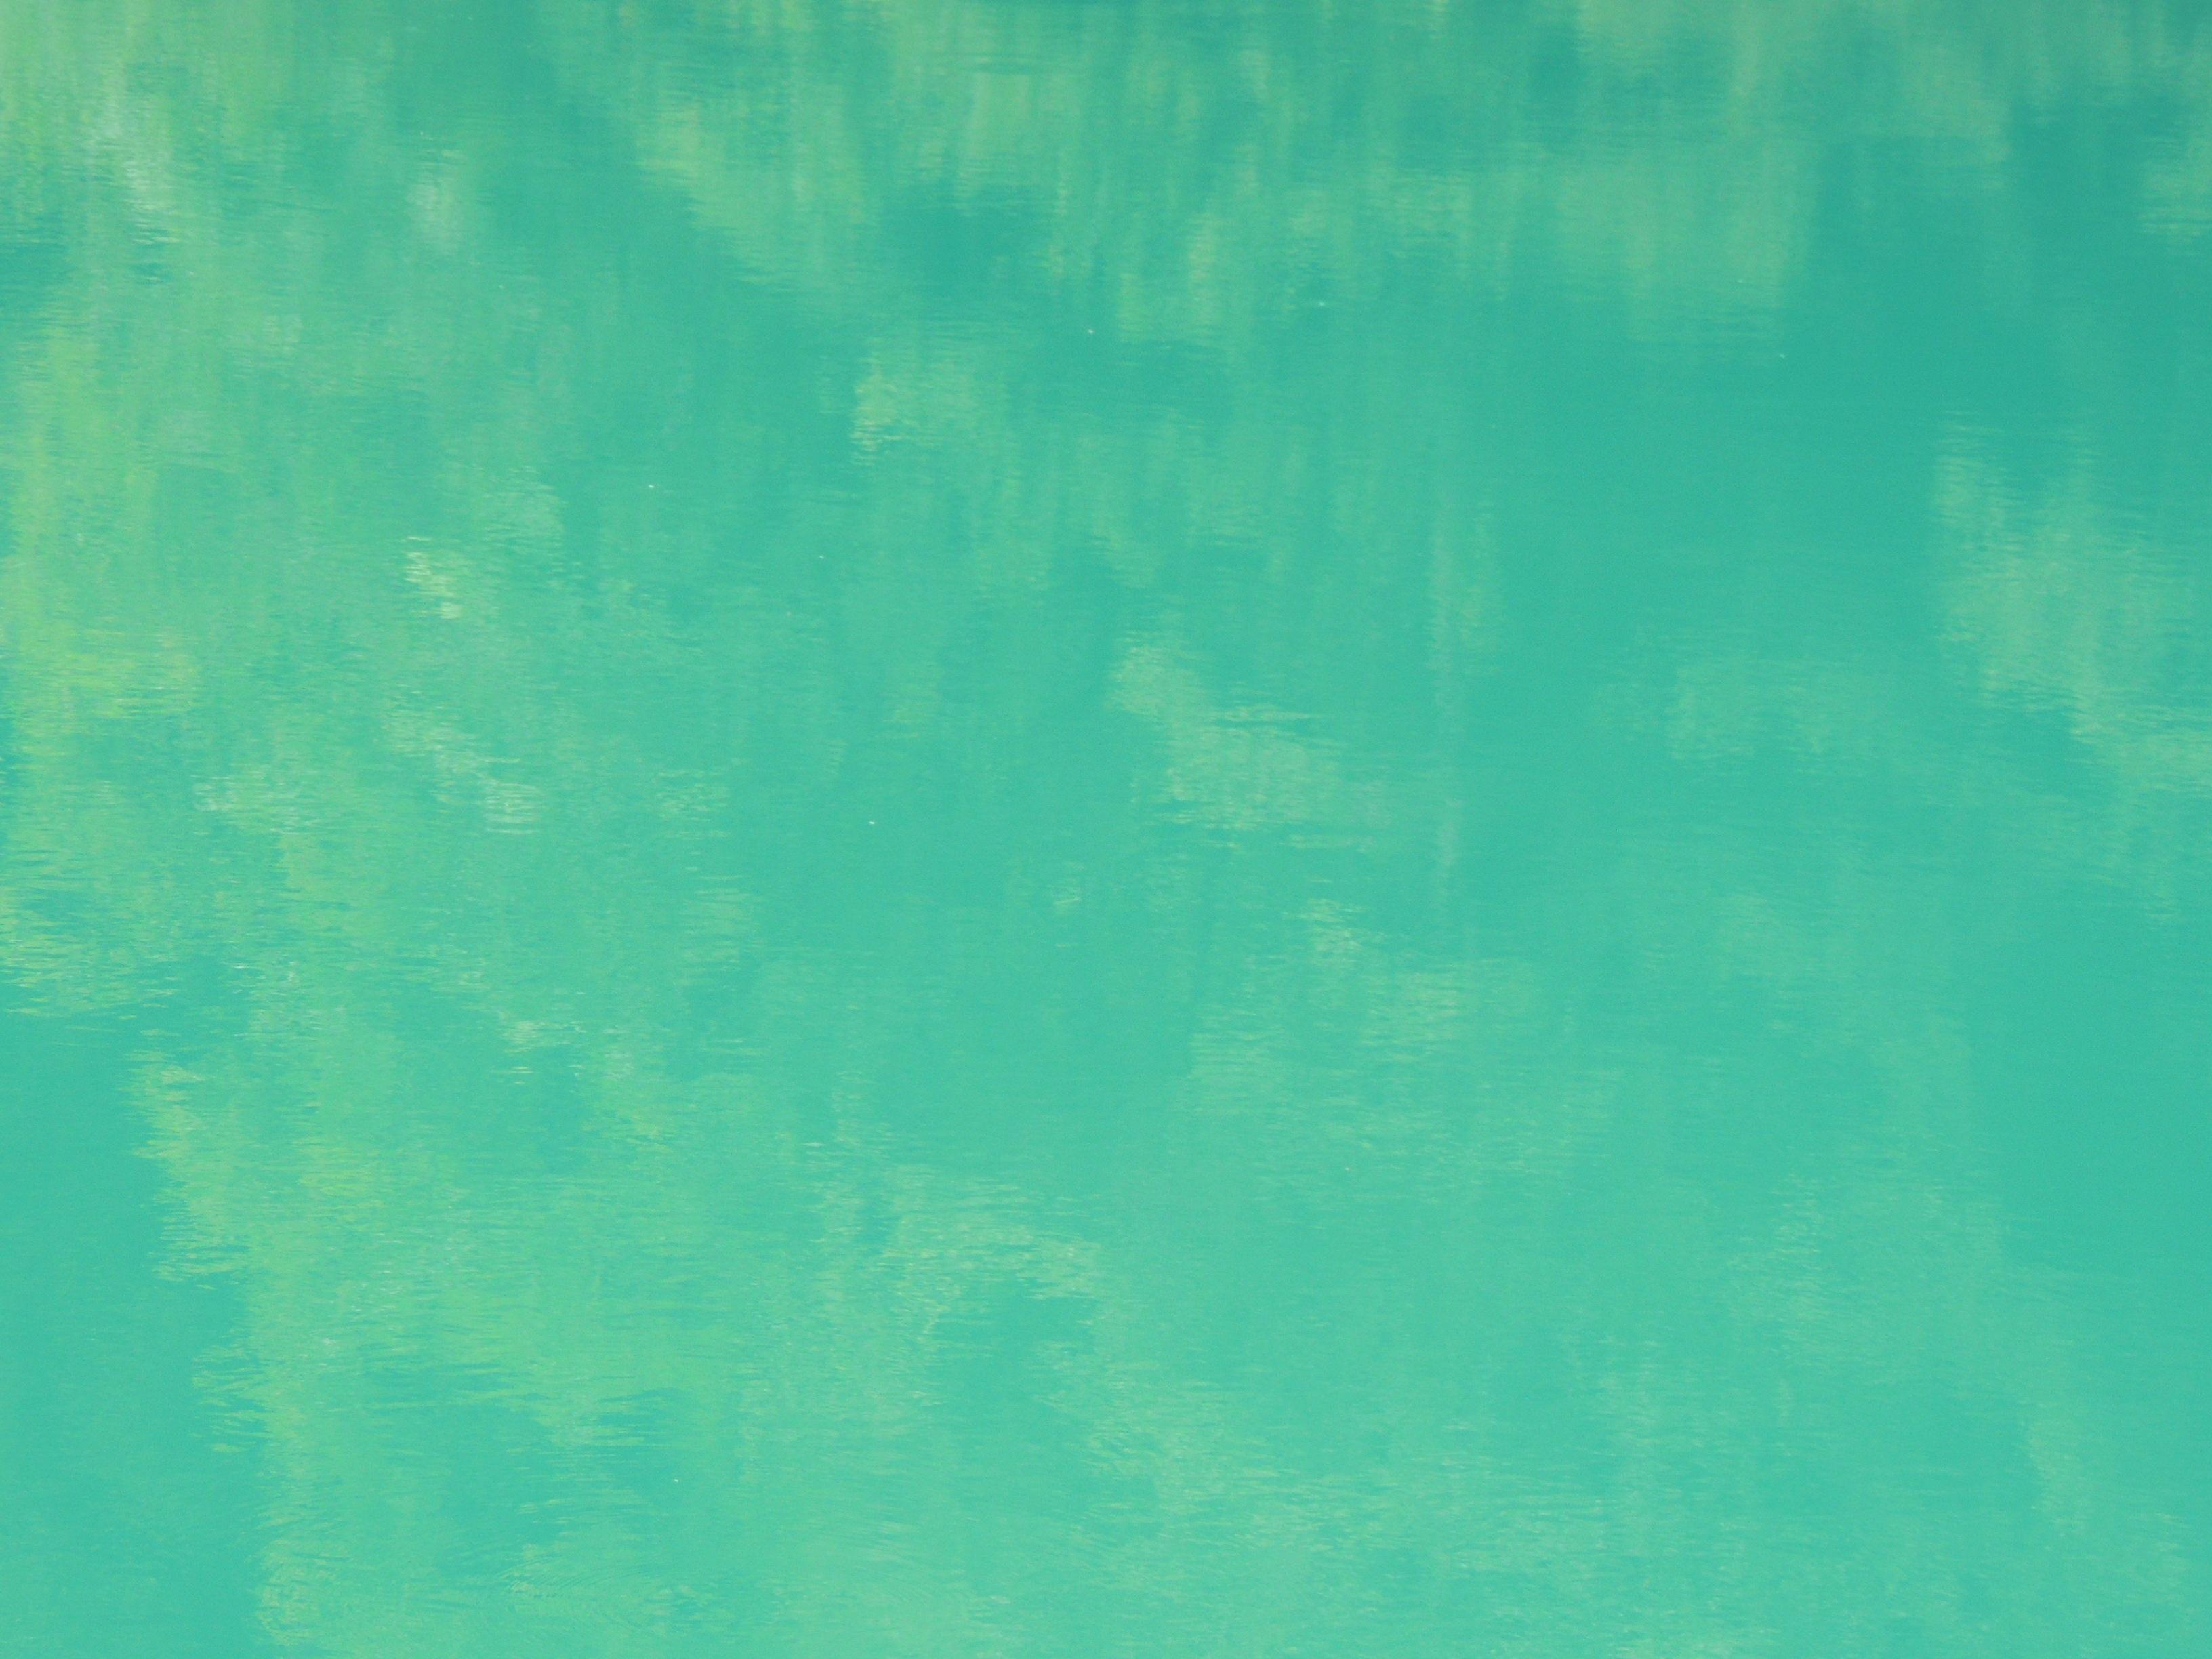 Fondos De Color Verde Agua: Fotos Gratis : Agua, Cielo, Textura, Ola, Línea